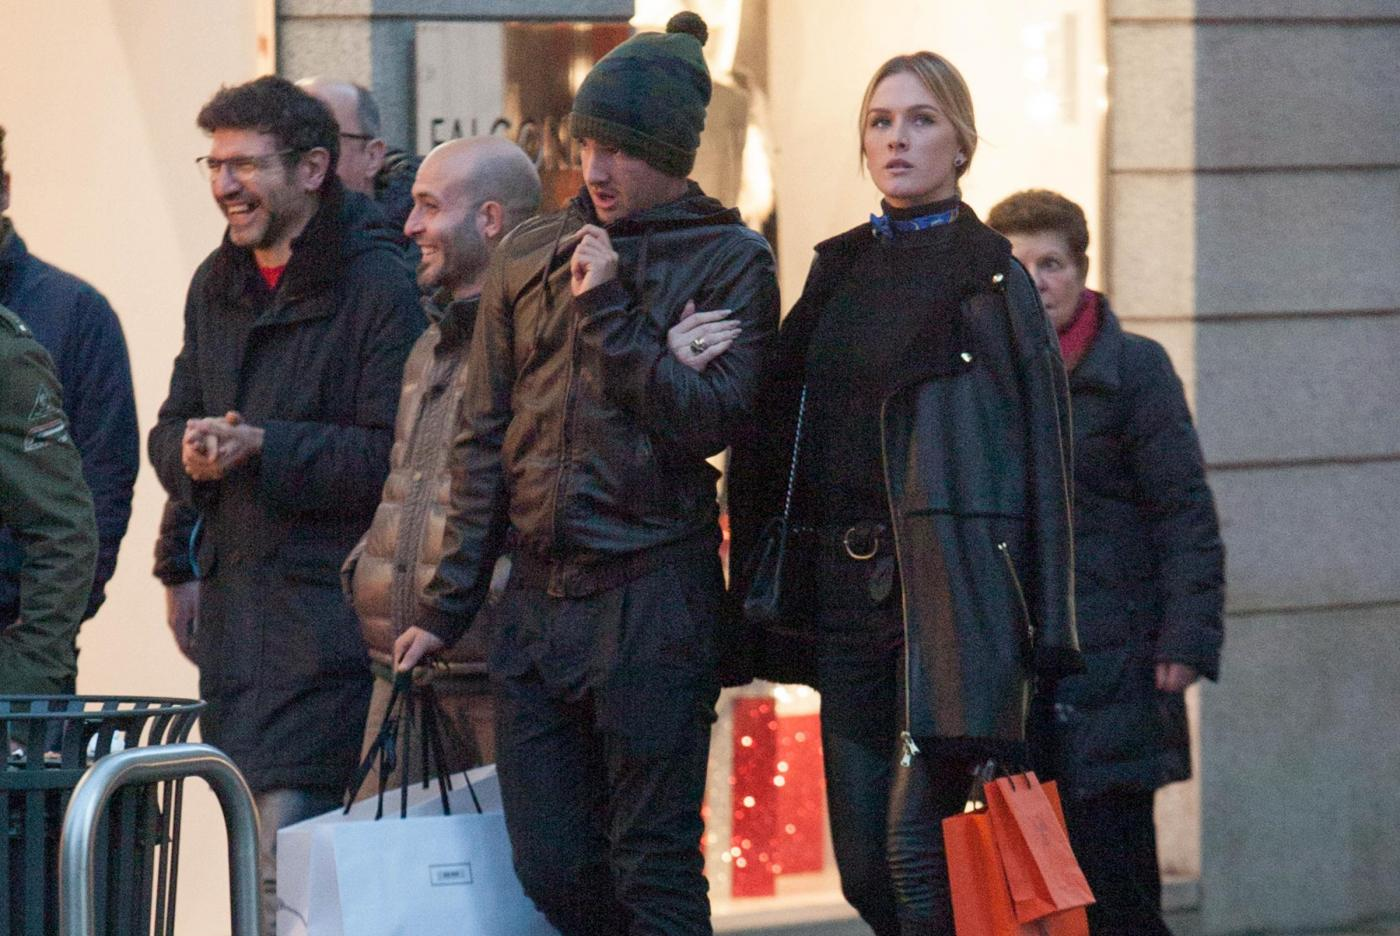 Pato, shopping a Milano con fidanzata Fiorella Mattheis10